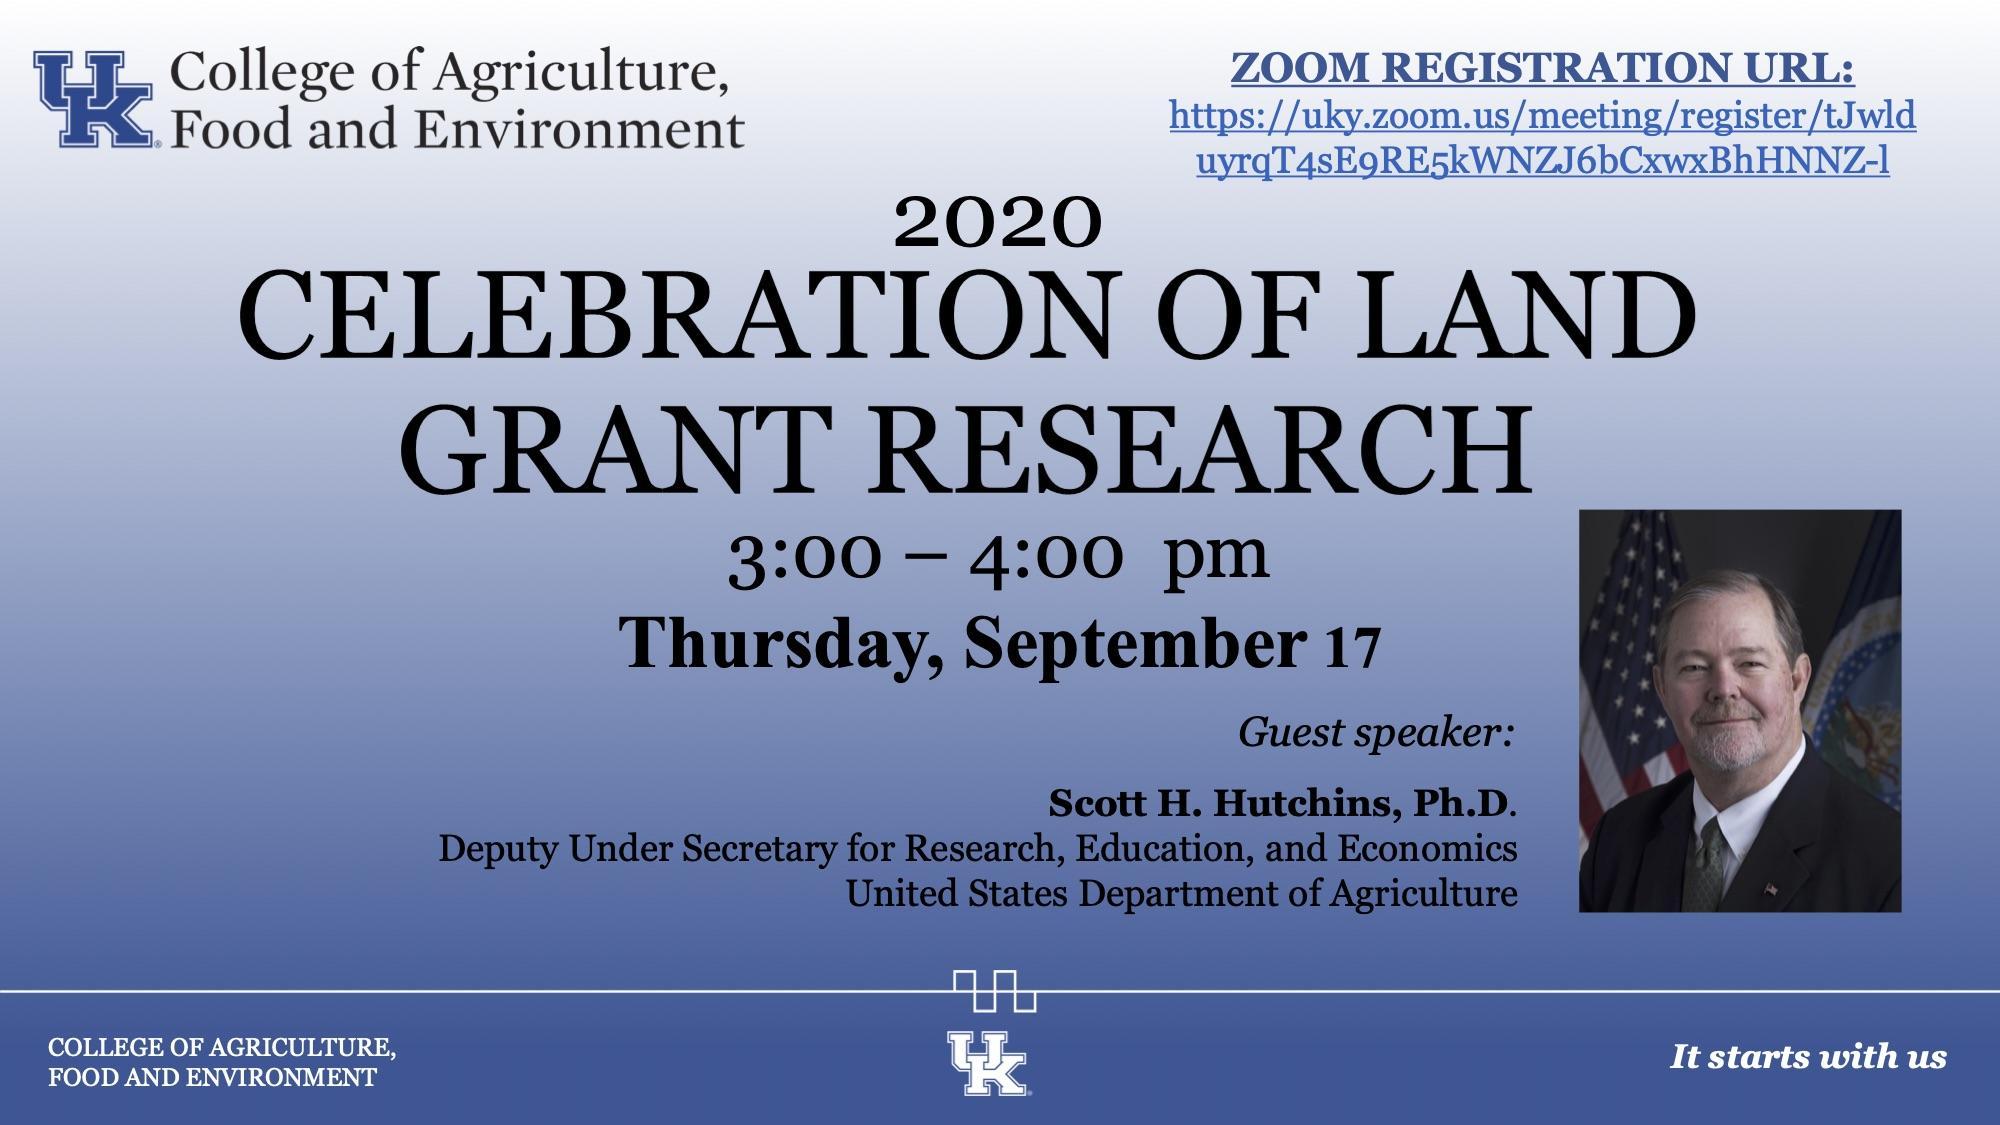 Celebration of Land Gran Research 3pm - 4pm Thursday, September 17, 2020